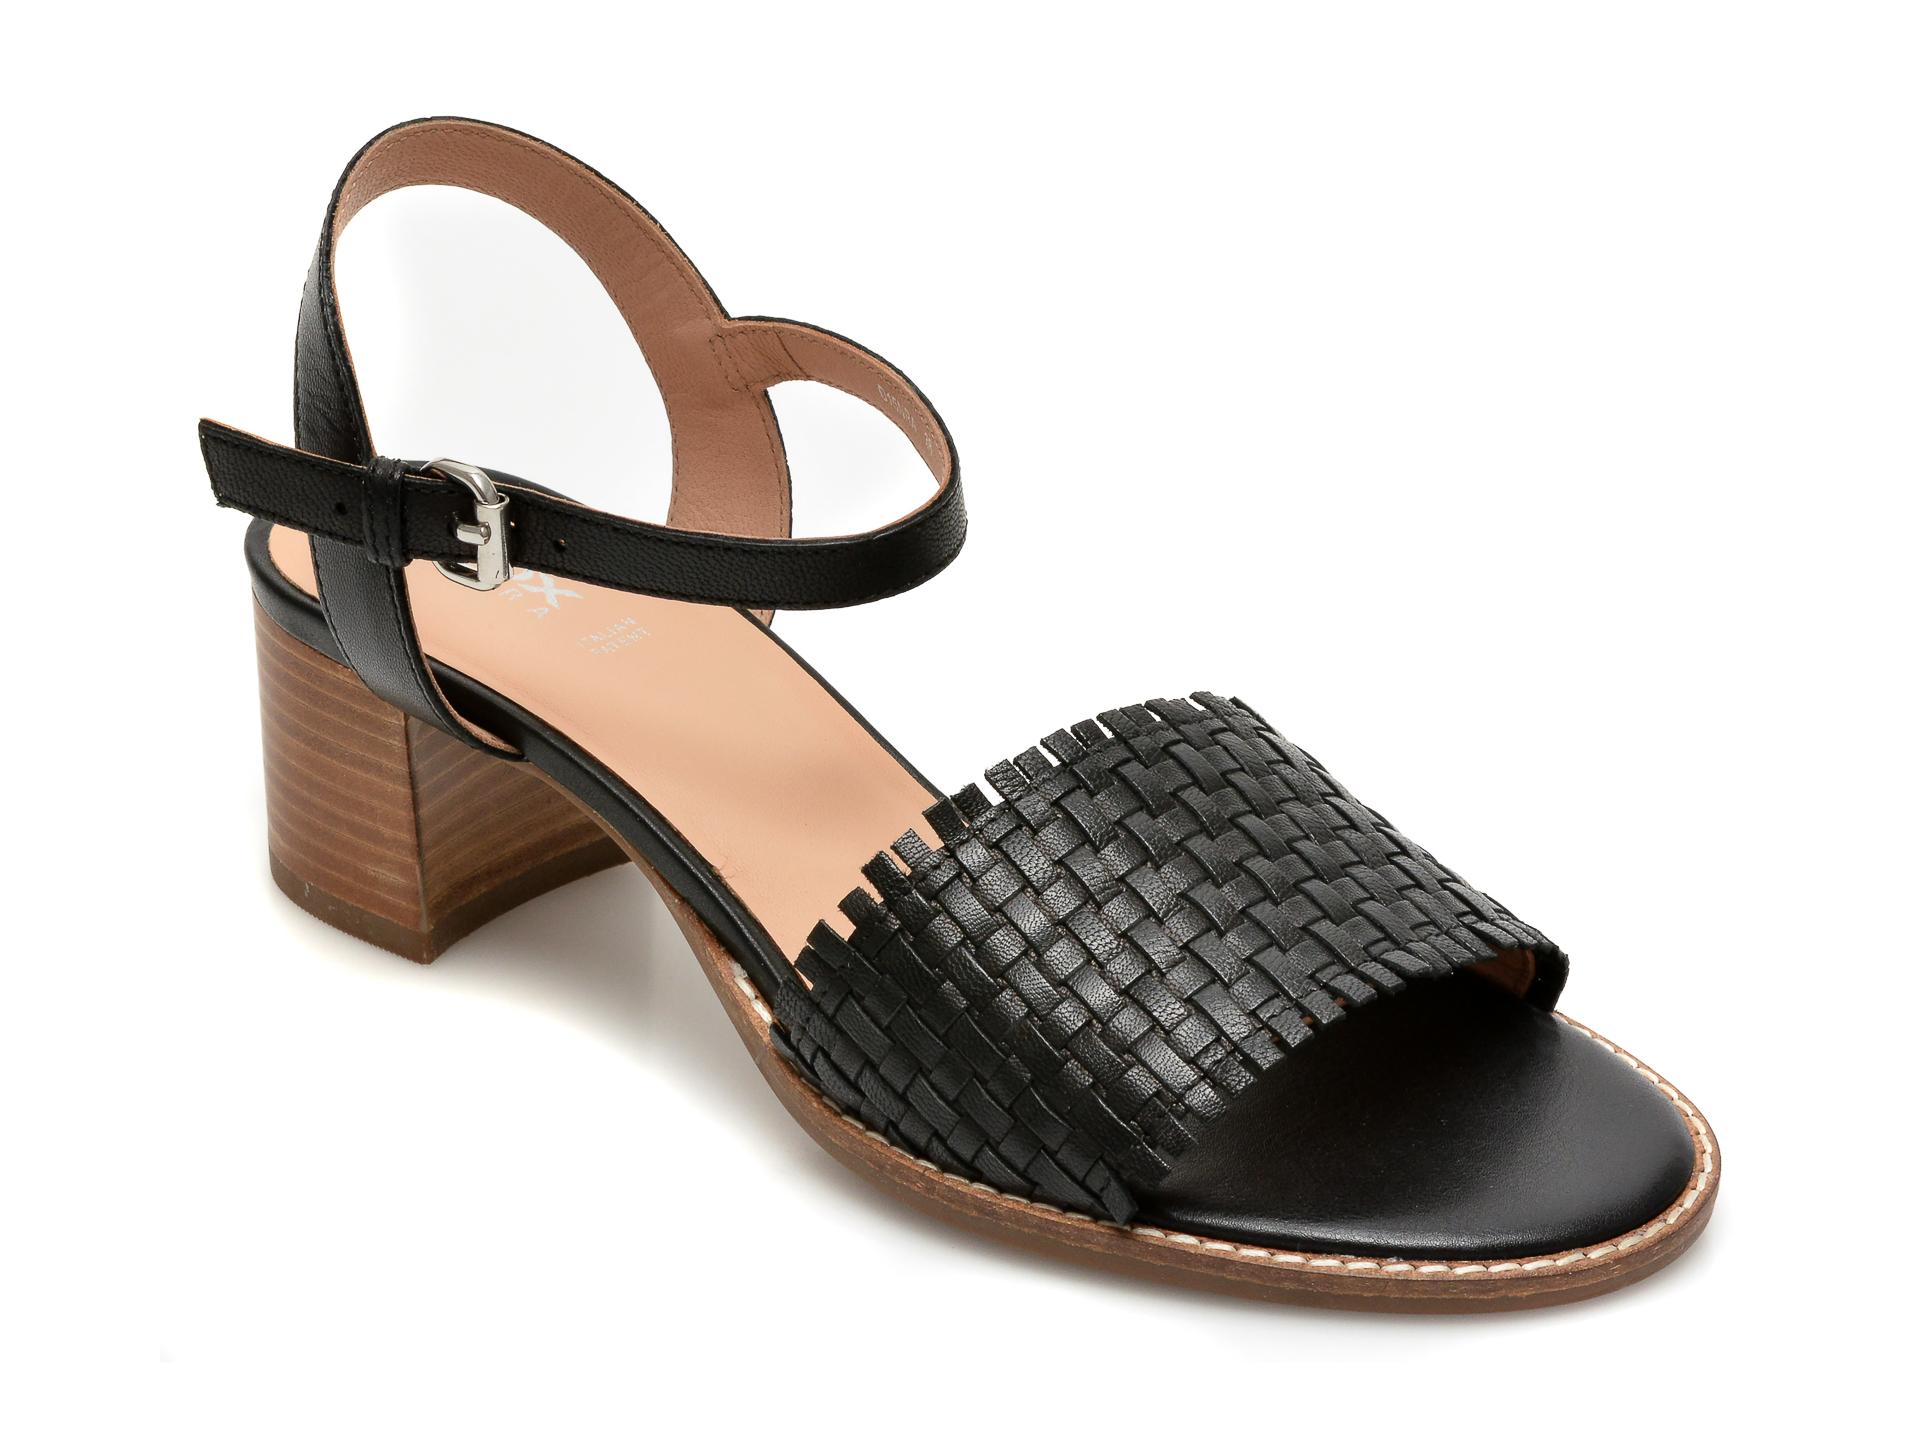 Sandale GEOX negre, D15NRA, din piele naturala New